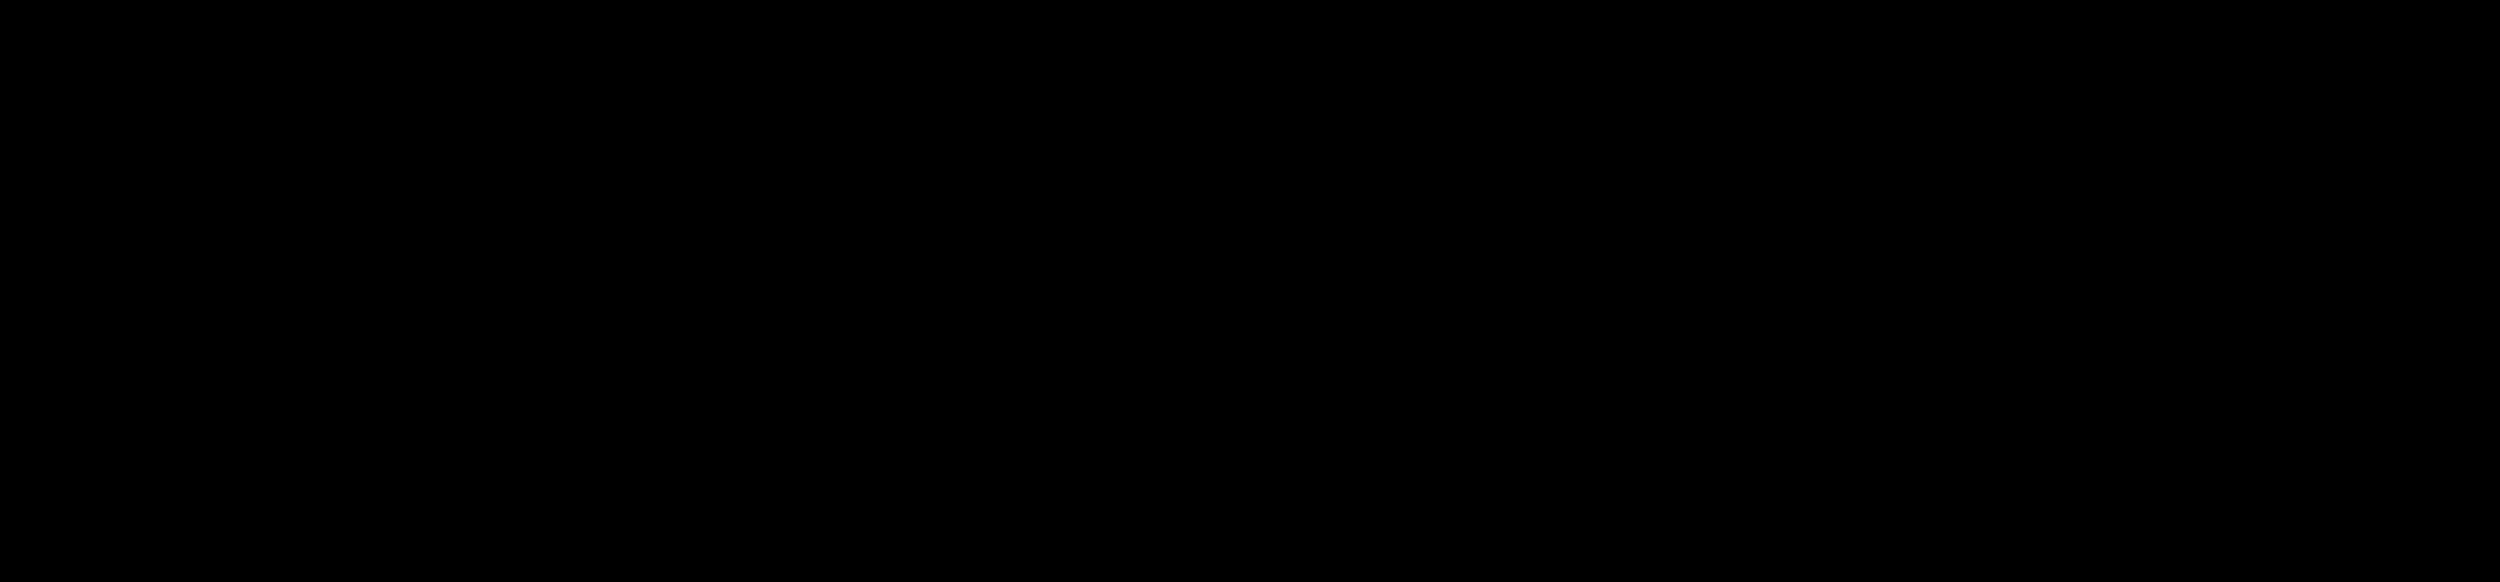 nameseearle_logo_flat.png